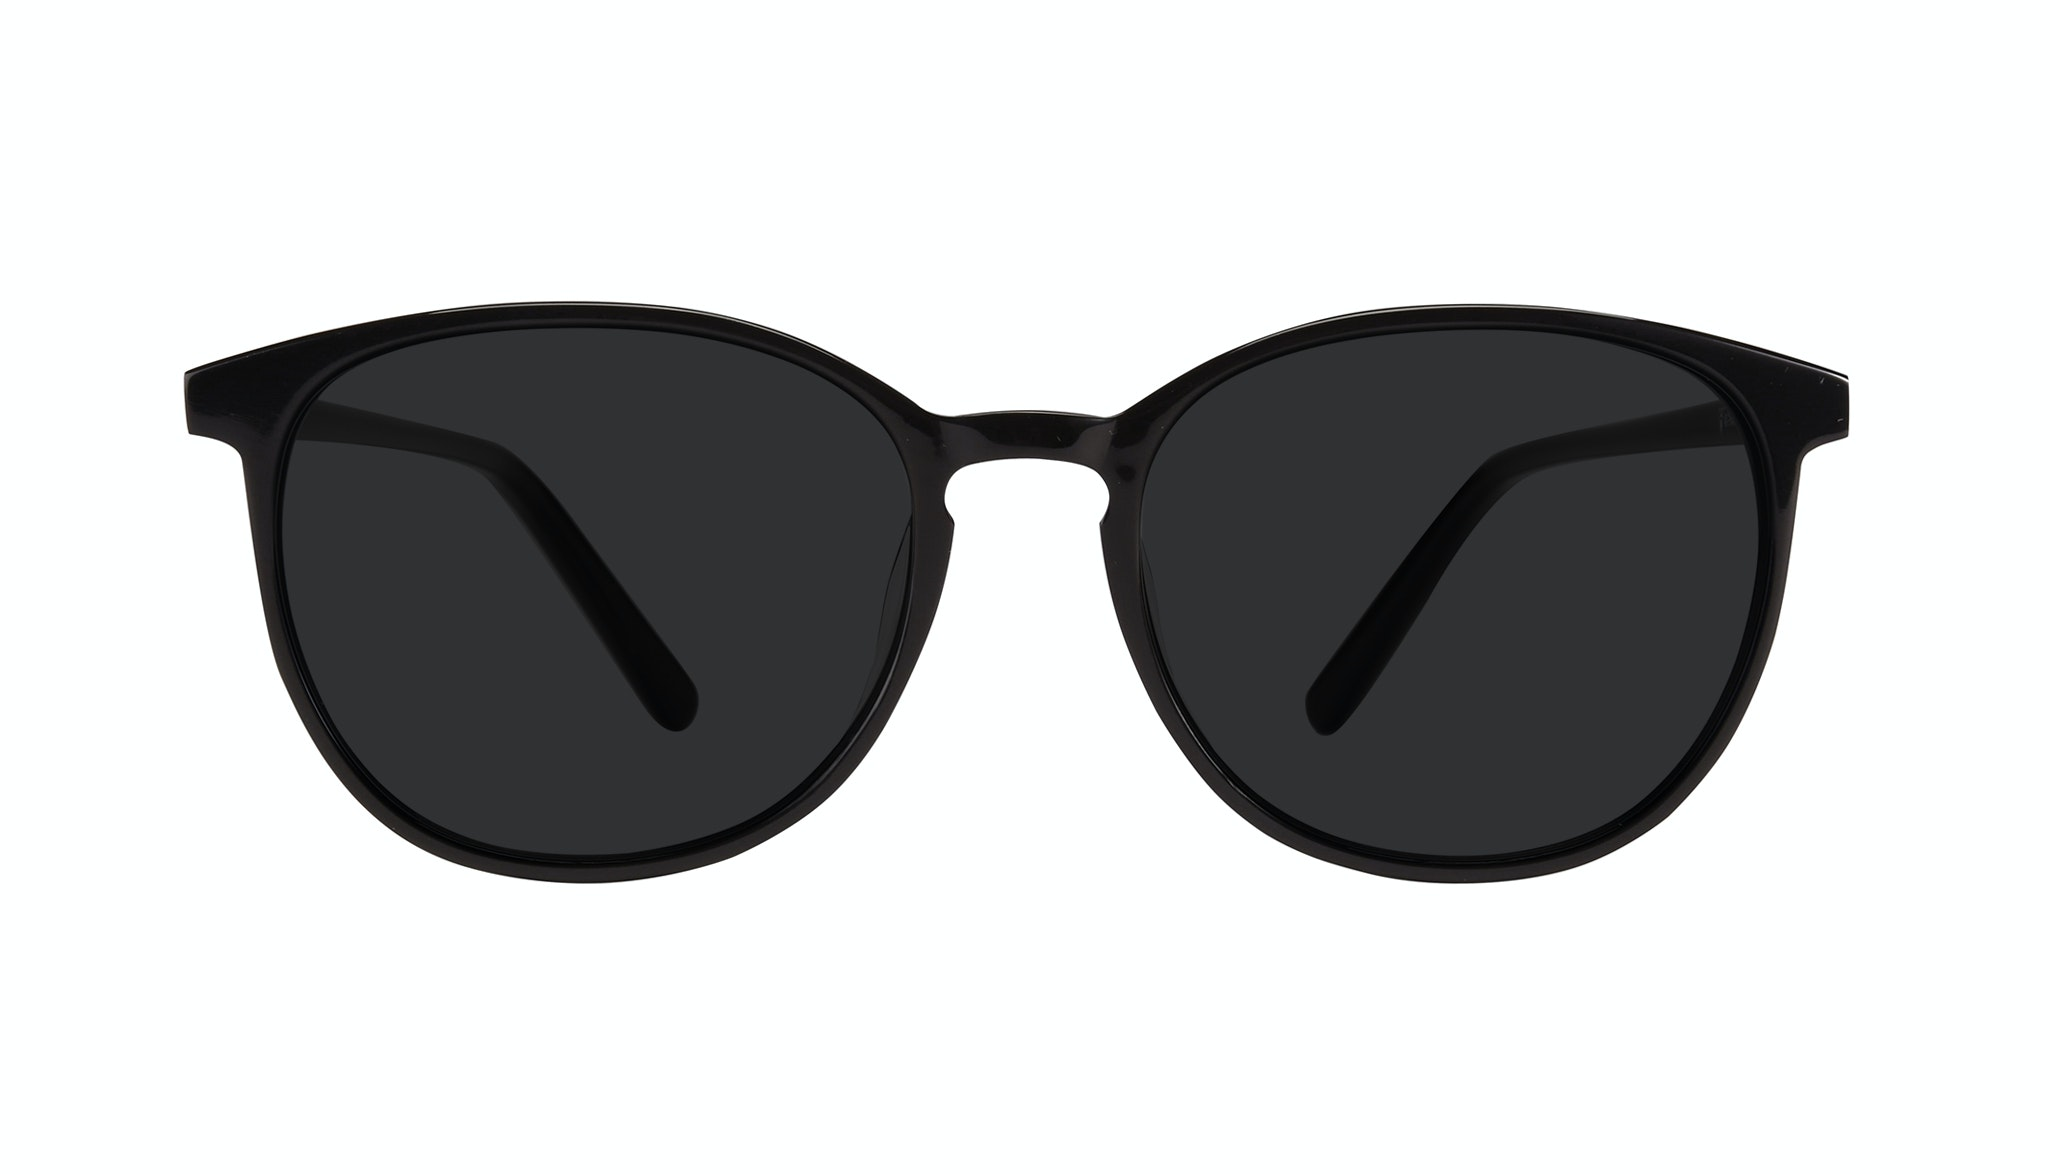 Affordable Fashion Glasses Round Sunglasses Women Femme Libre Emilie